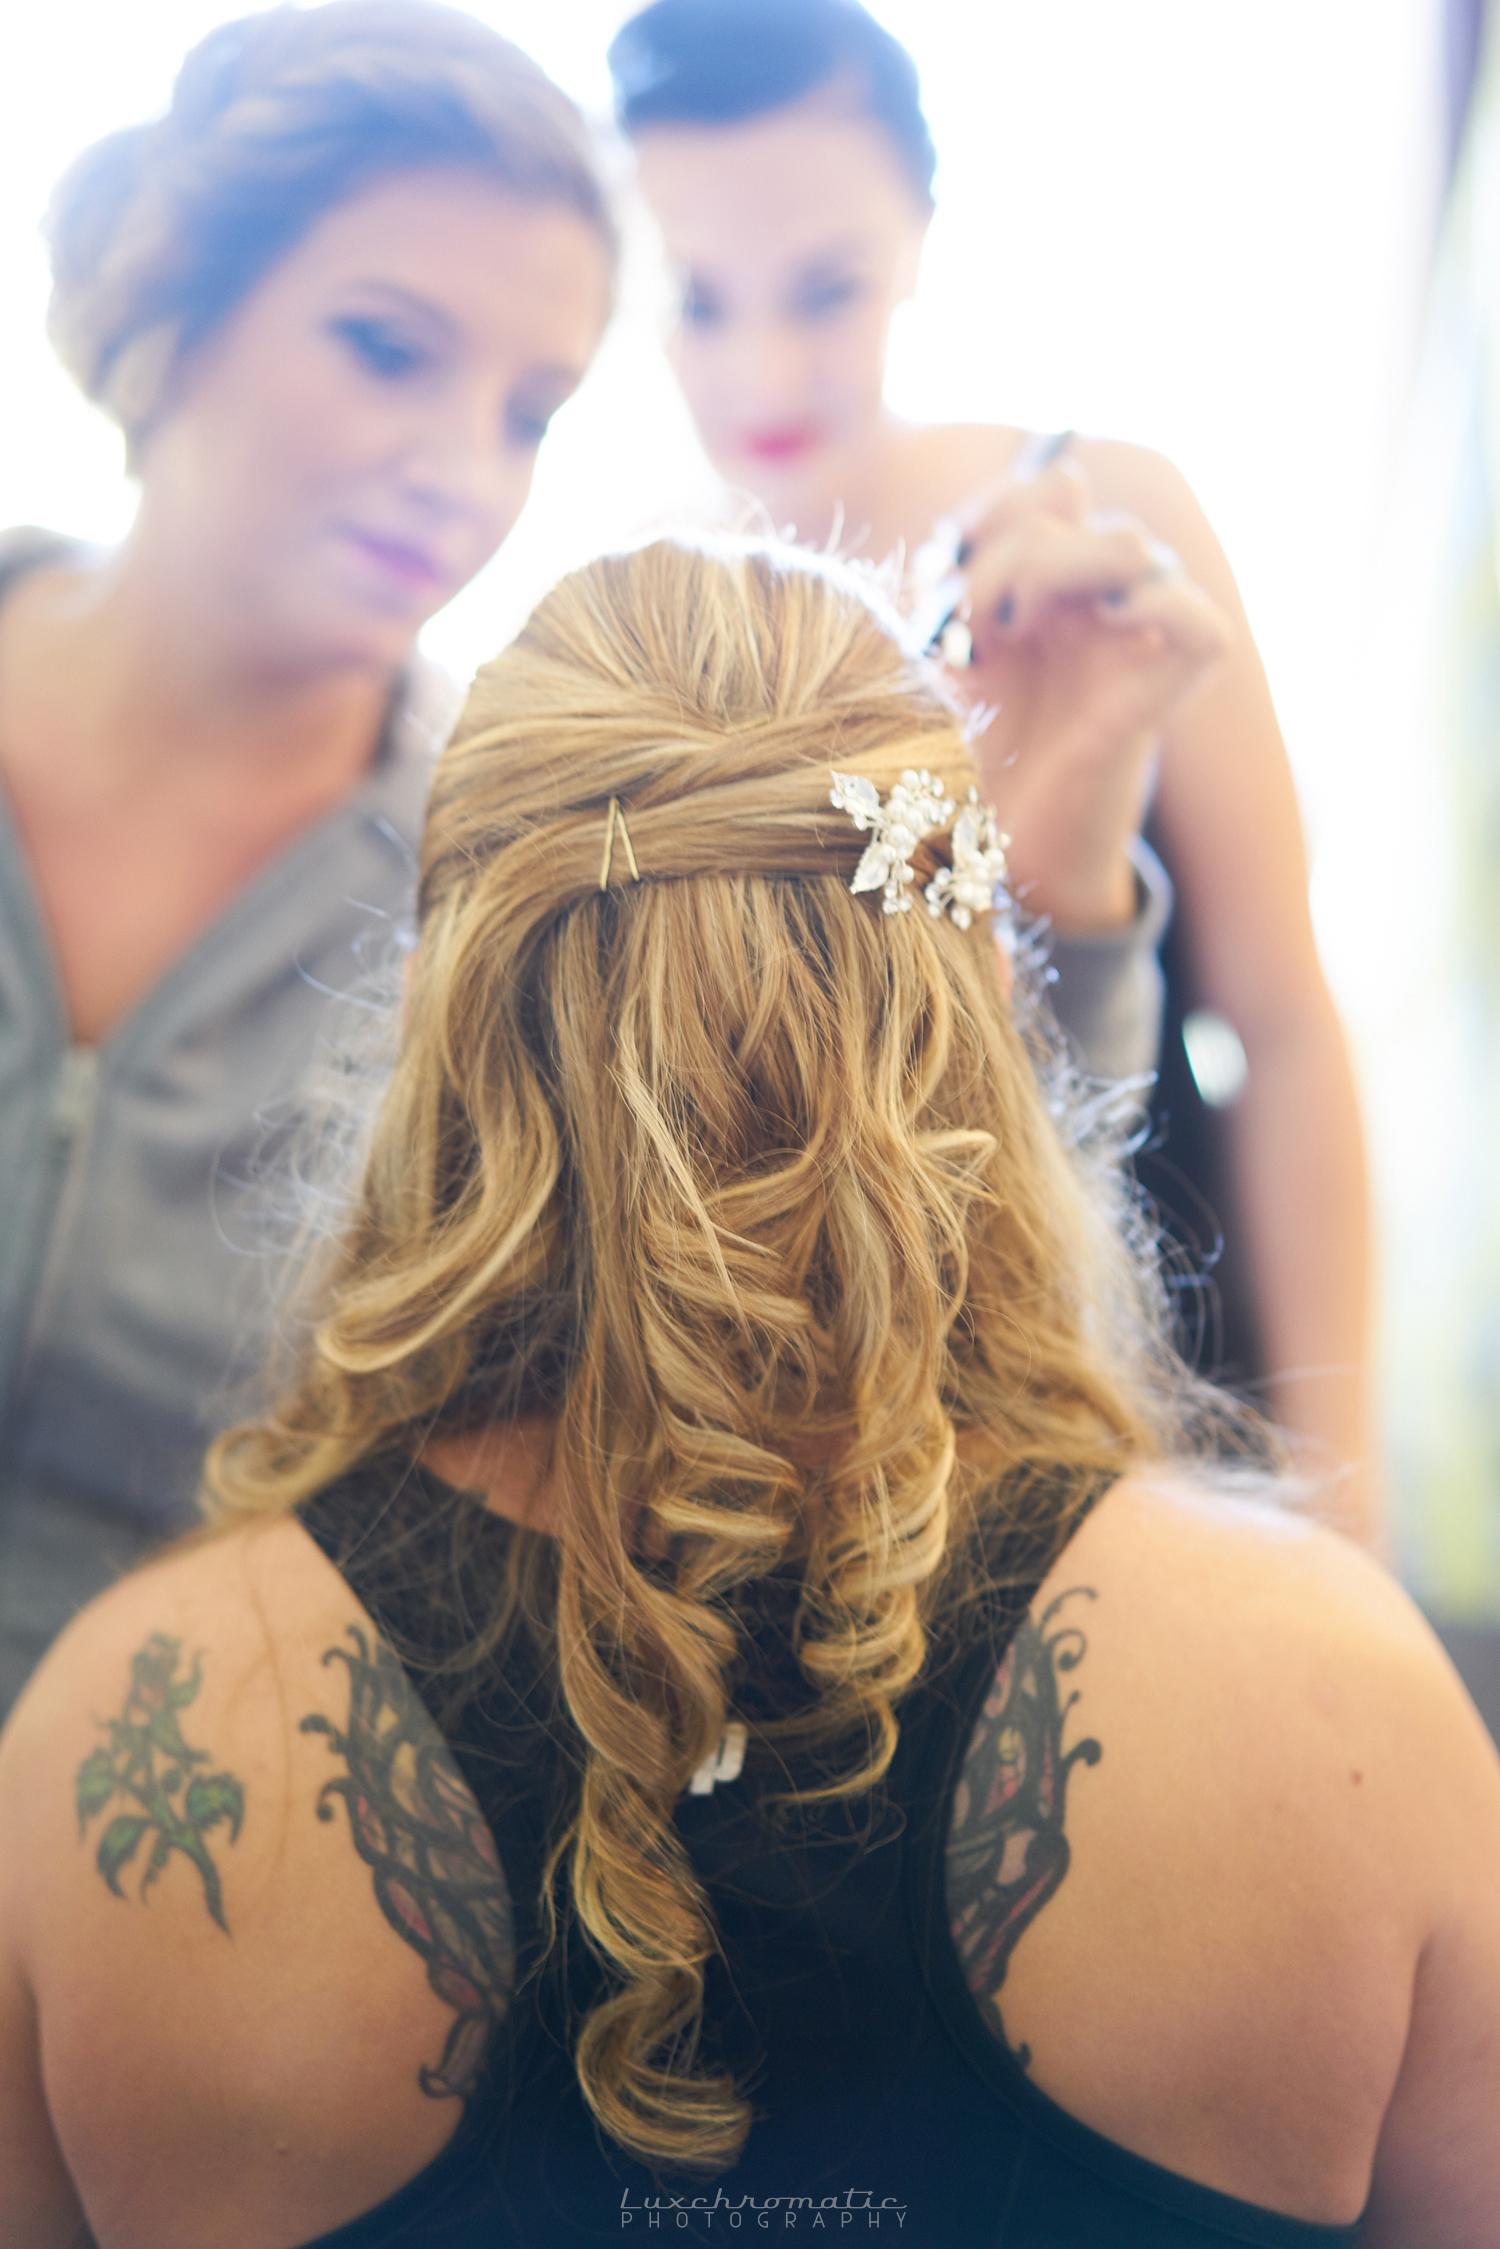 081217_Rachel_Chris_a0071-weddingdress-bride-weddingphotography-weddingphotographer-bridal-groom-wedding-engagementring-proposal-brides-diamondring-sonyalpha-sony-sonya9-sonya7rii-sanfrancisco-sf-bayarea-photographer-profoto-murrietas-well.jpg